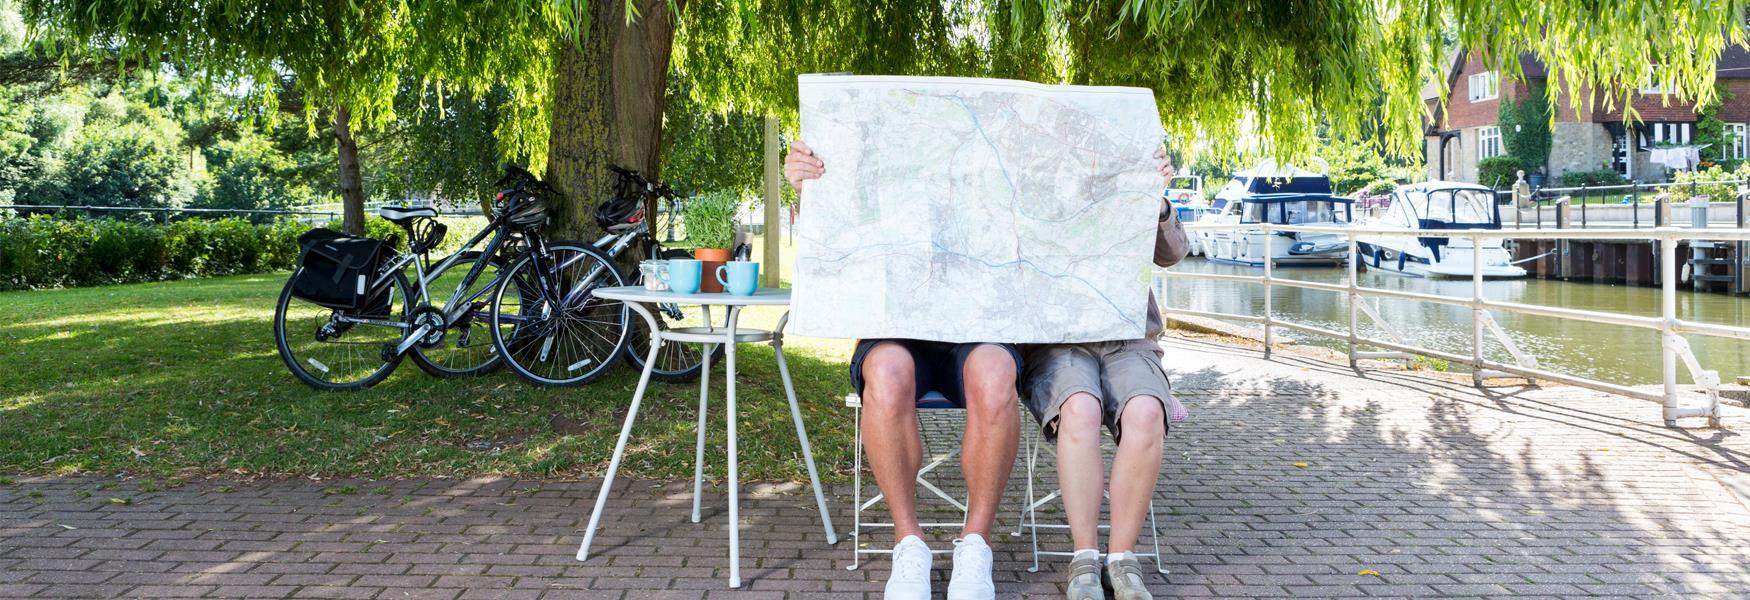 Cyclists taking a break at Allington Lock